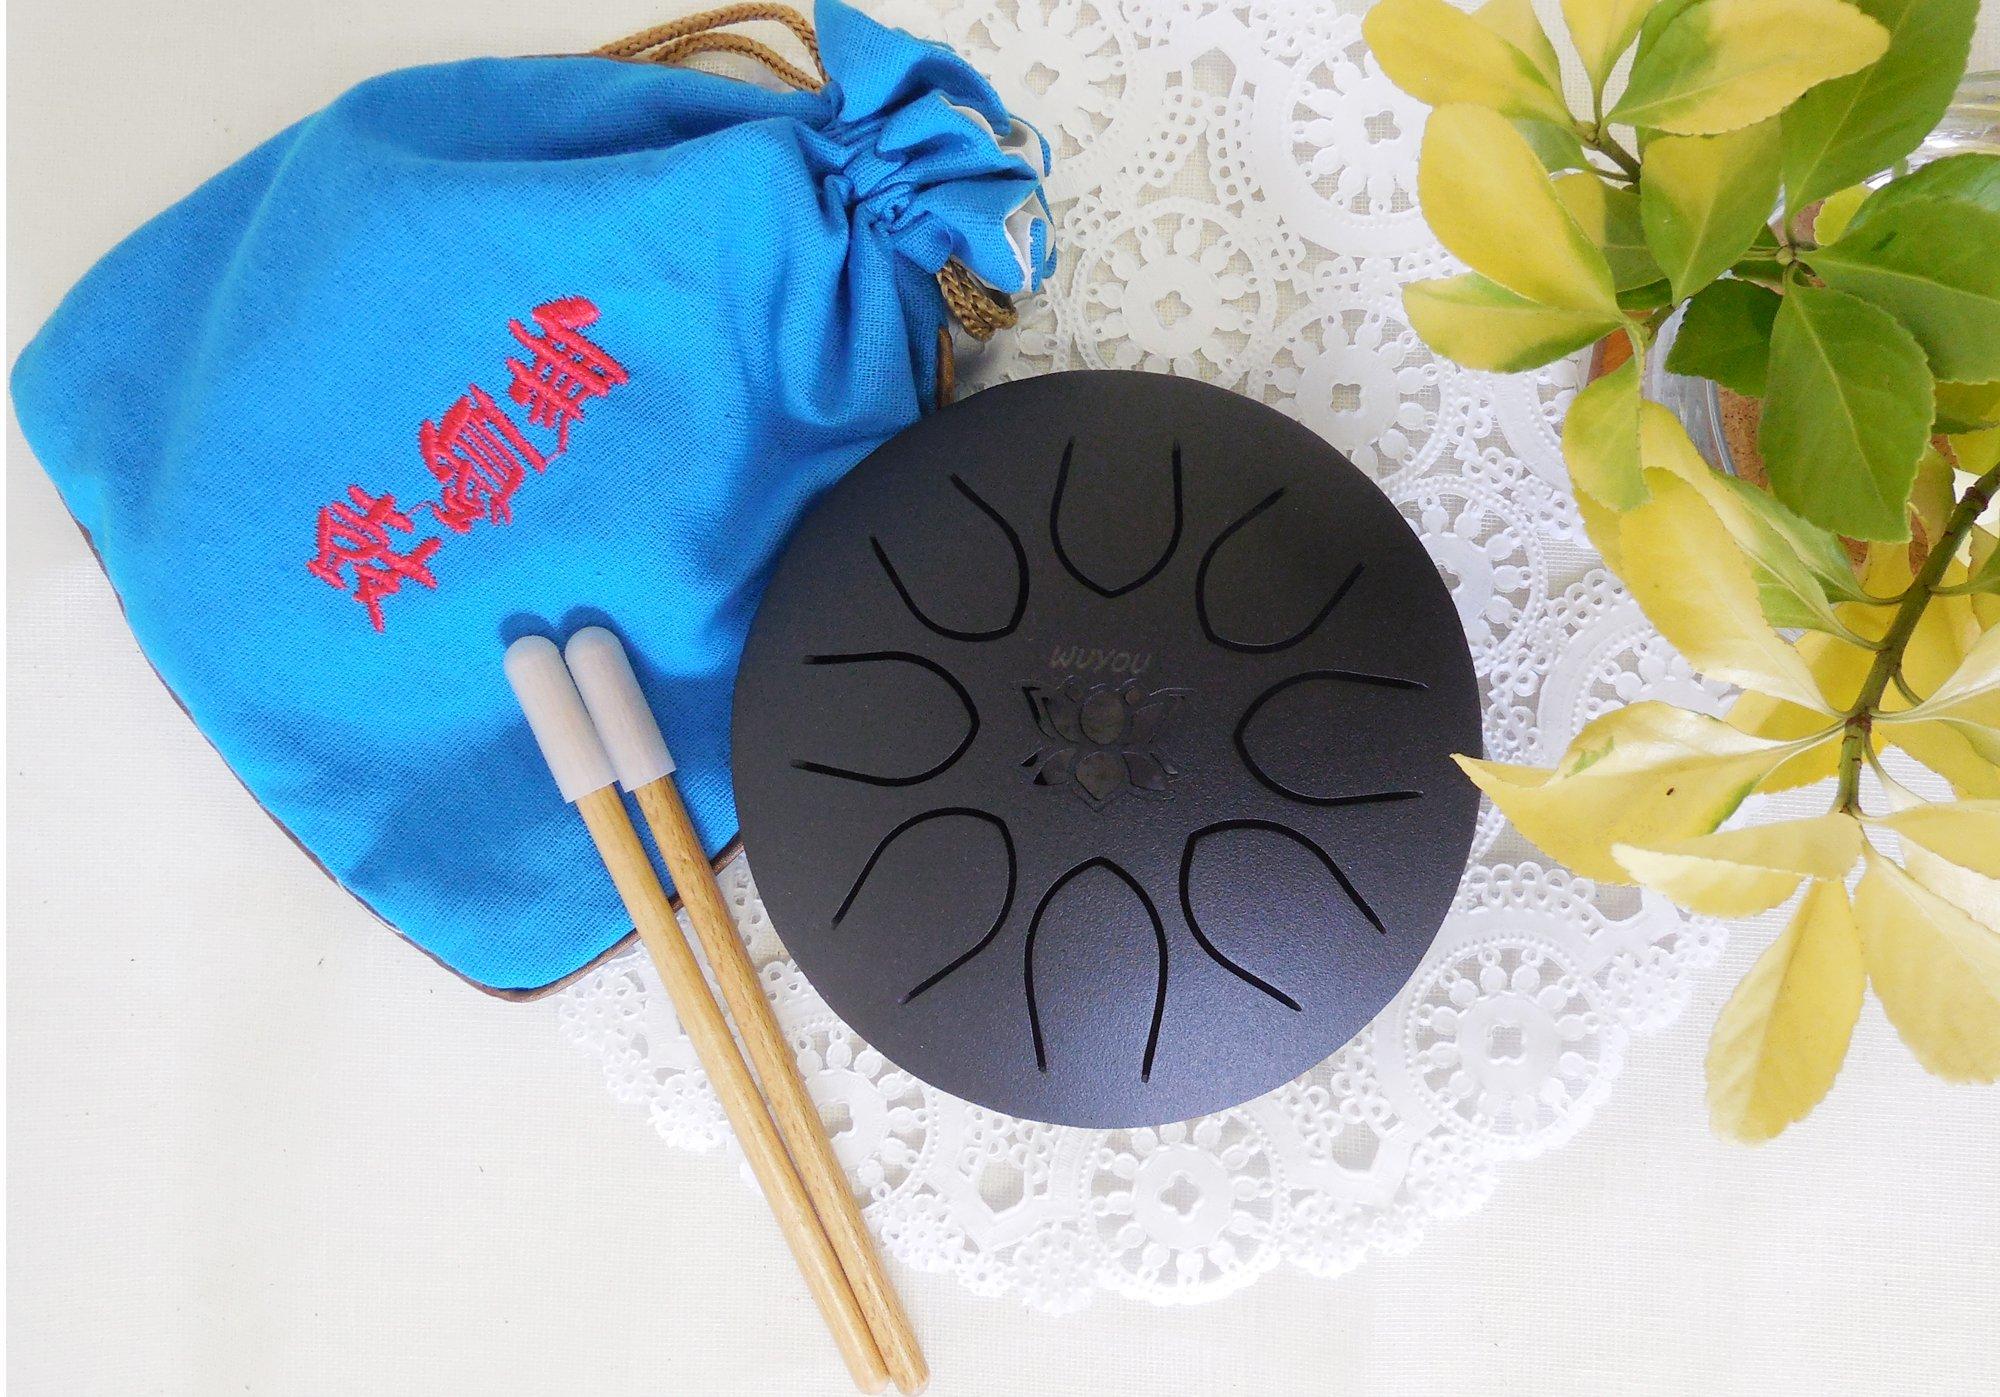 WuYou Chakra Drum Mini Tongue Drum Tank Handpan UFO series, Great for Meolodies Theropy (Black)